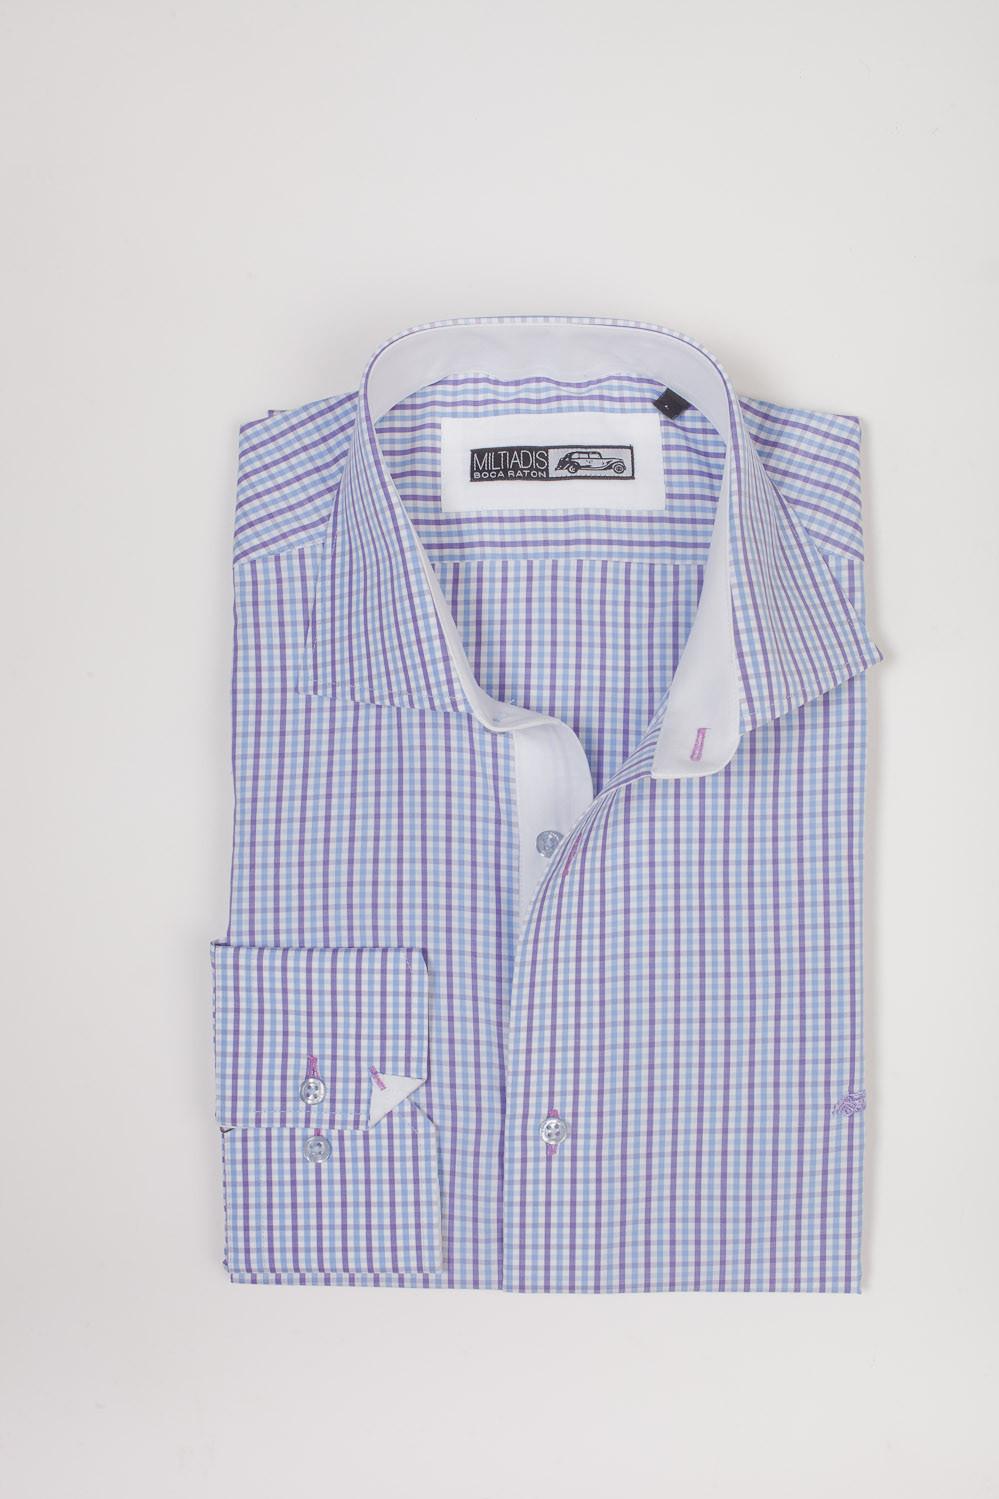 Men's Dress Shirts   Light Blue and Lavender Checkerboard Dress Shirt   Miltiadis XIII 06